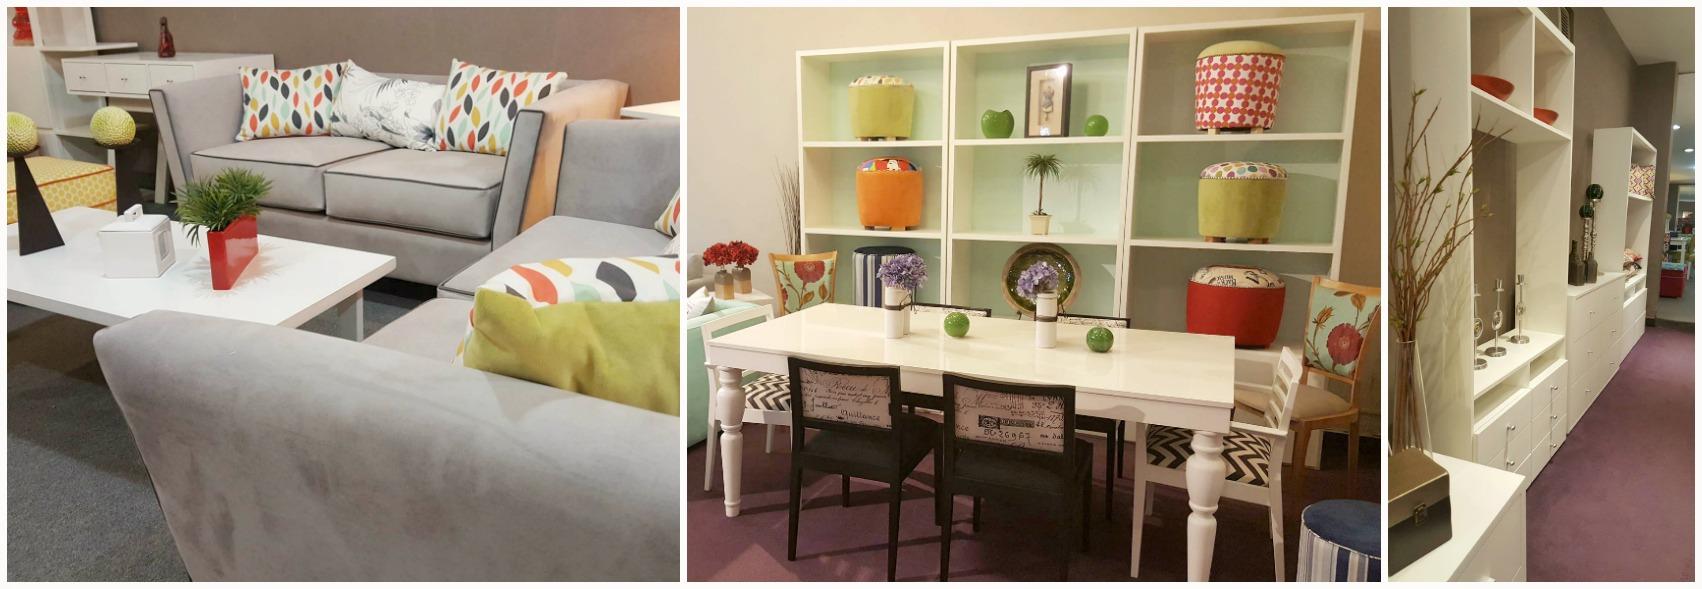 Belgica muebles for Muebles baratos online entrega inmediata